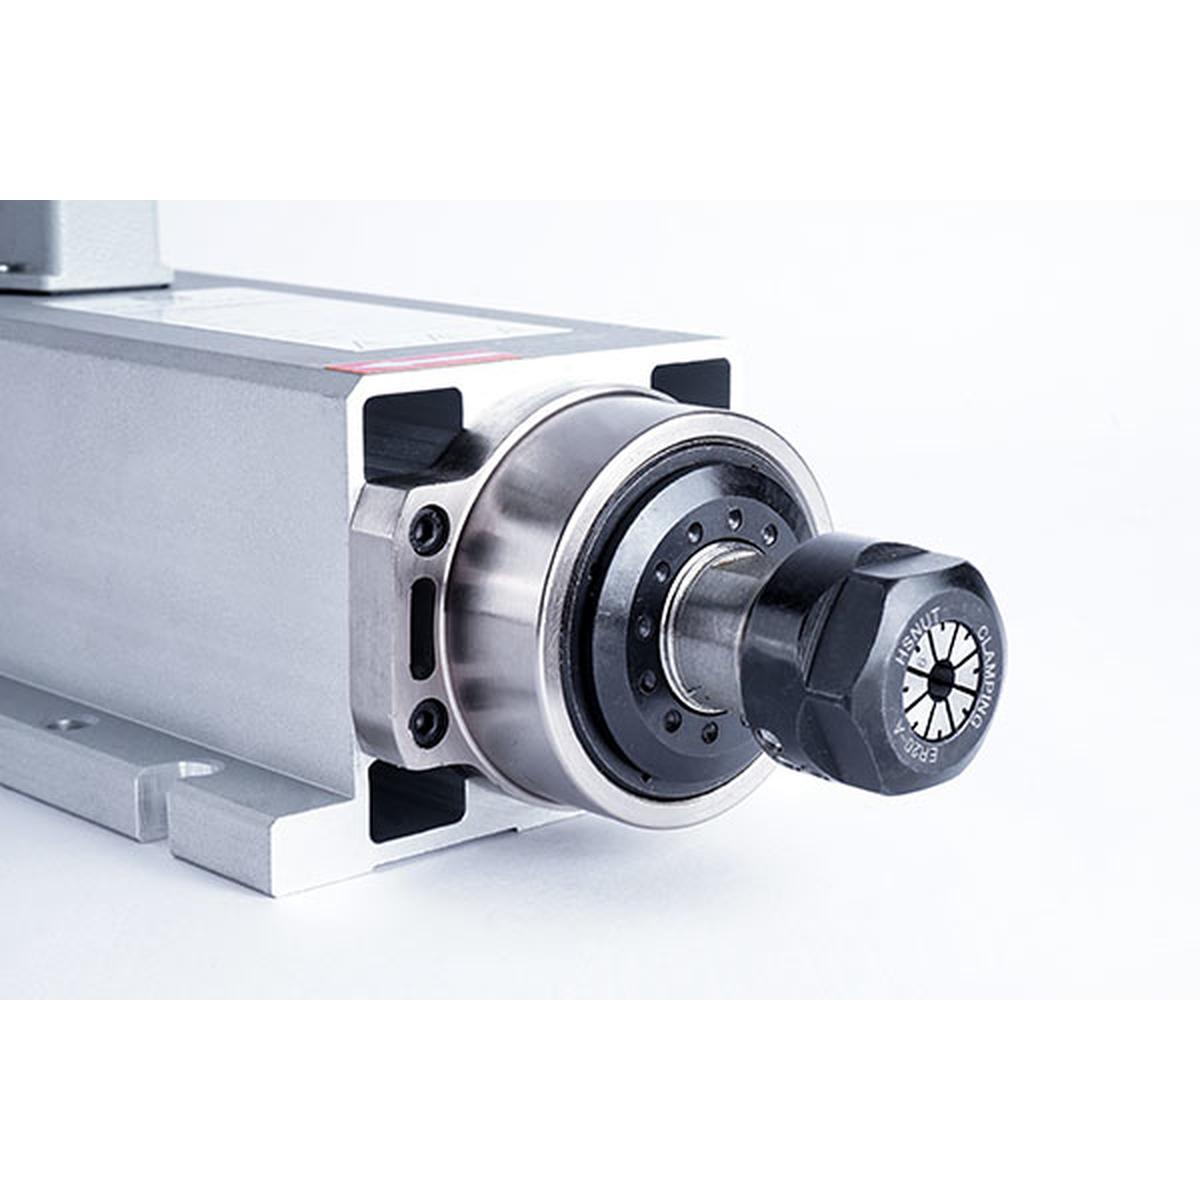 hfs-2200-a-milling-motor-eu_2